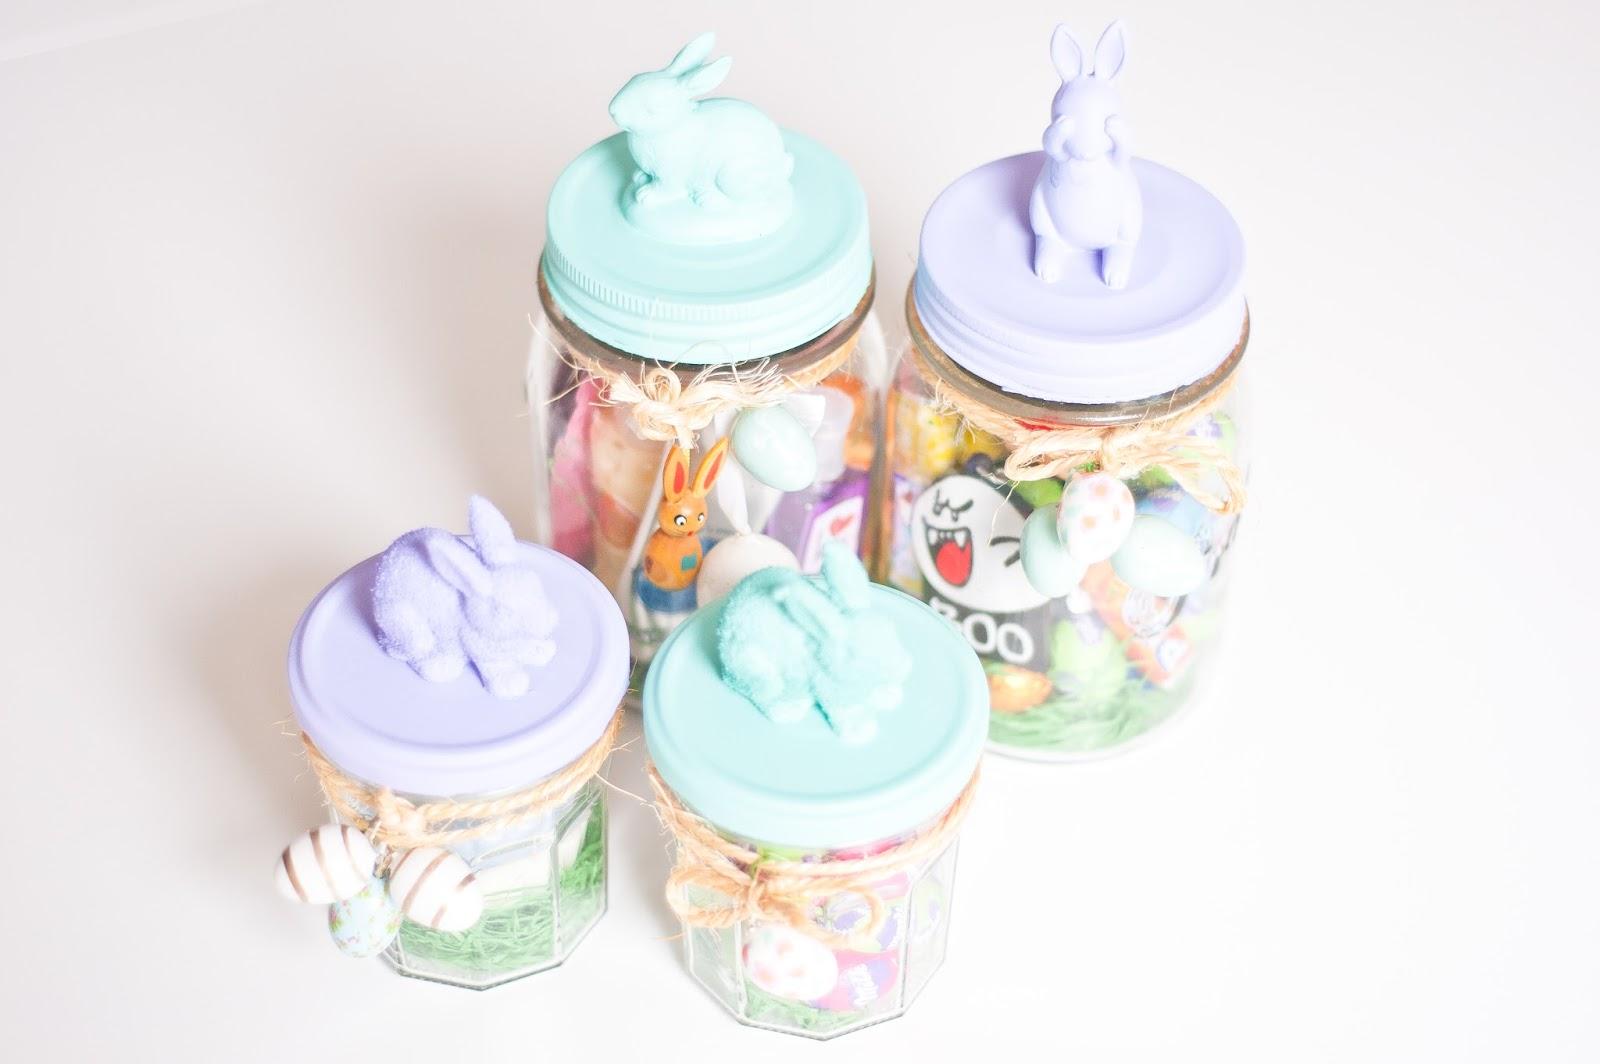 Mademoiselle nostalgeek gifts in a jar l 39 id e de cadeau - Idee pour paques ...